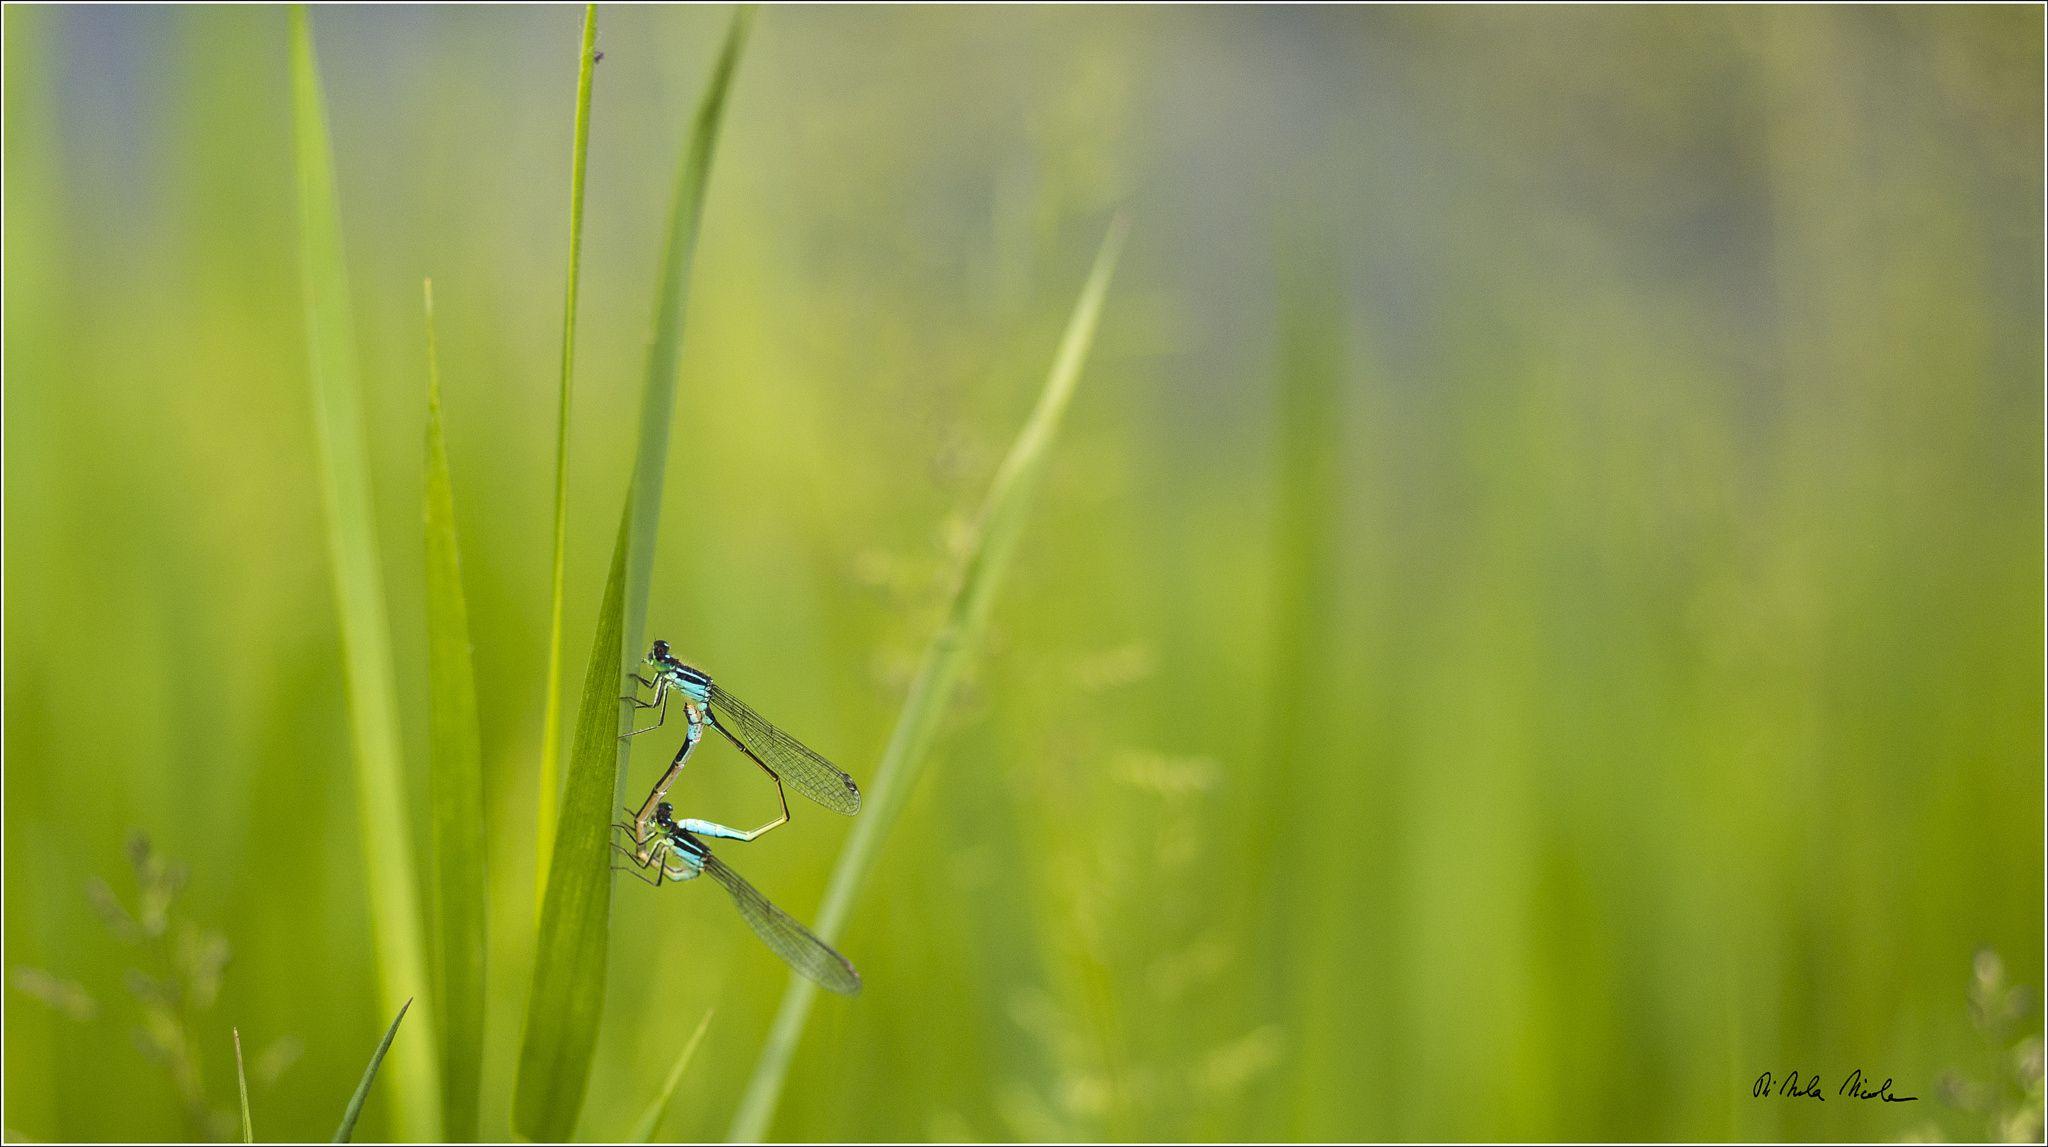 Tra i fili d'erba by Nicola Di Nola on 500px